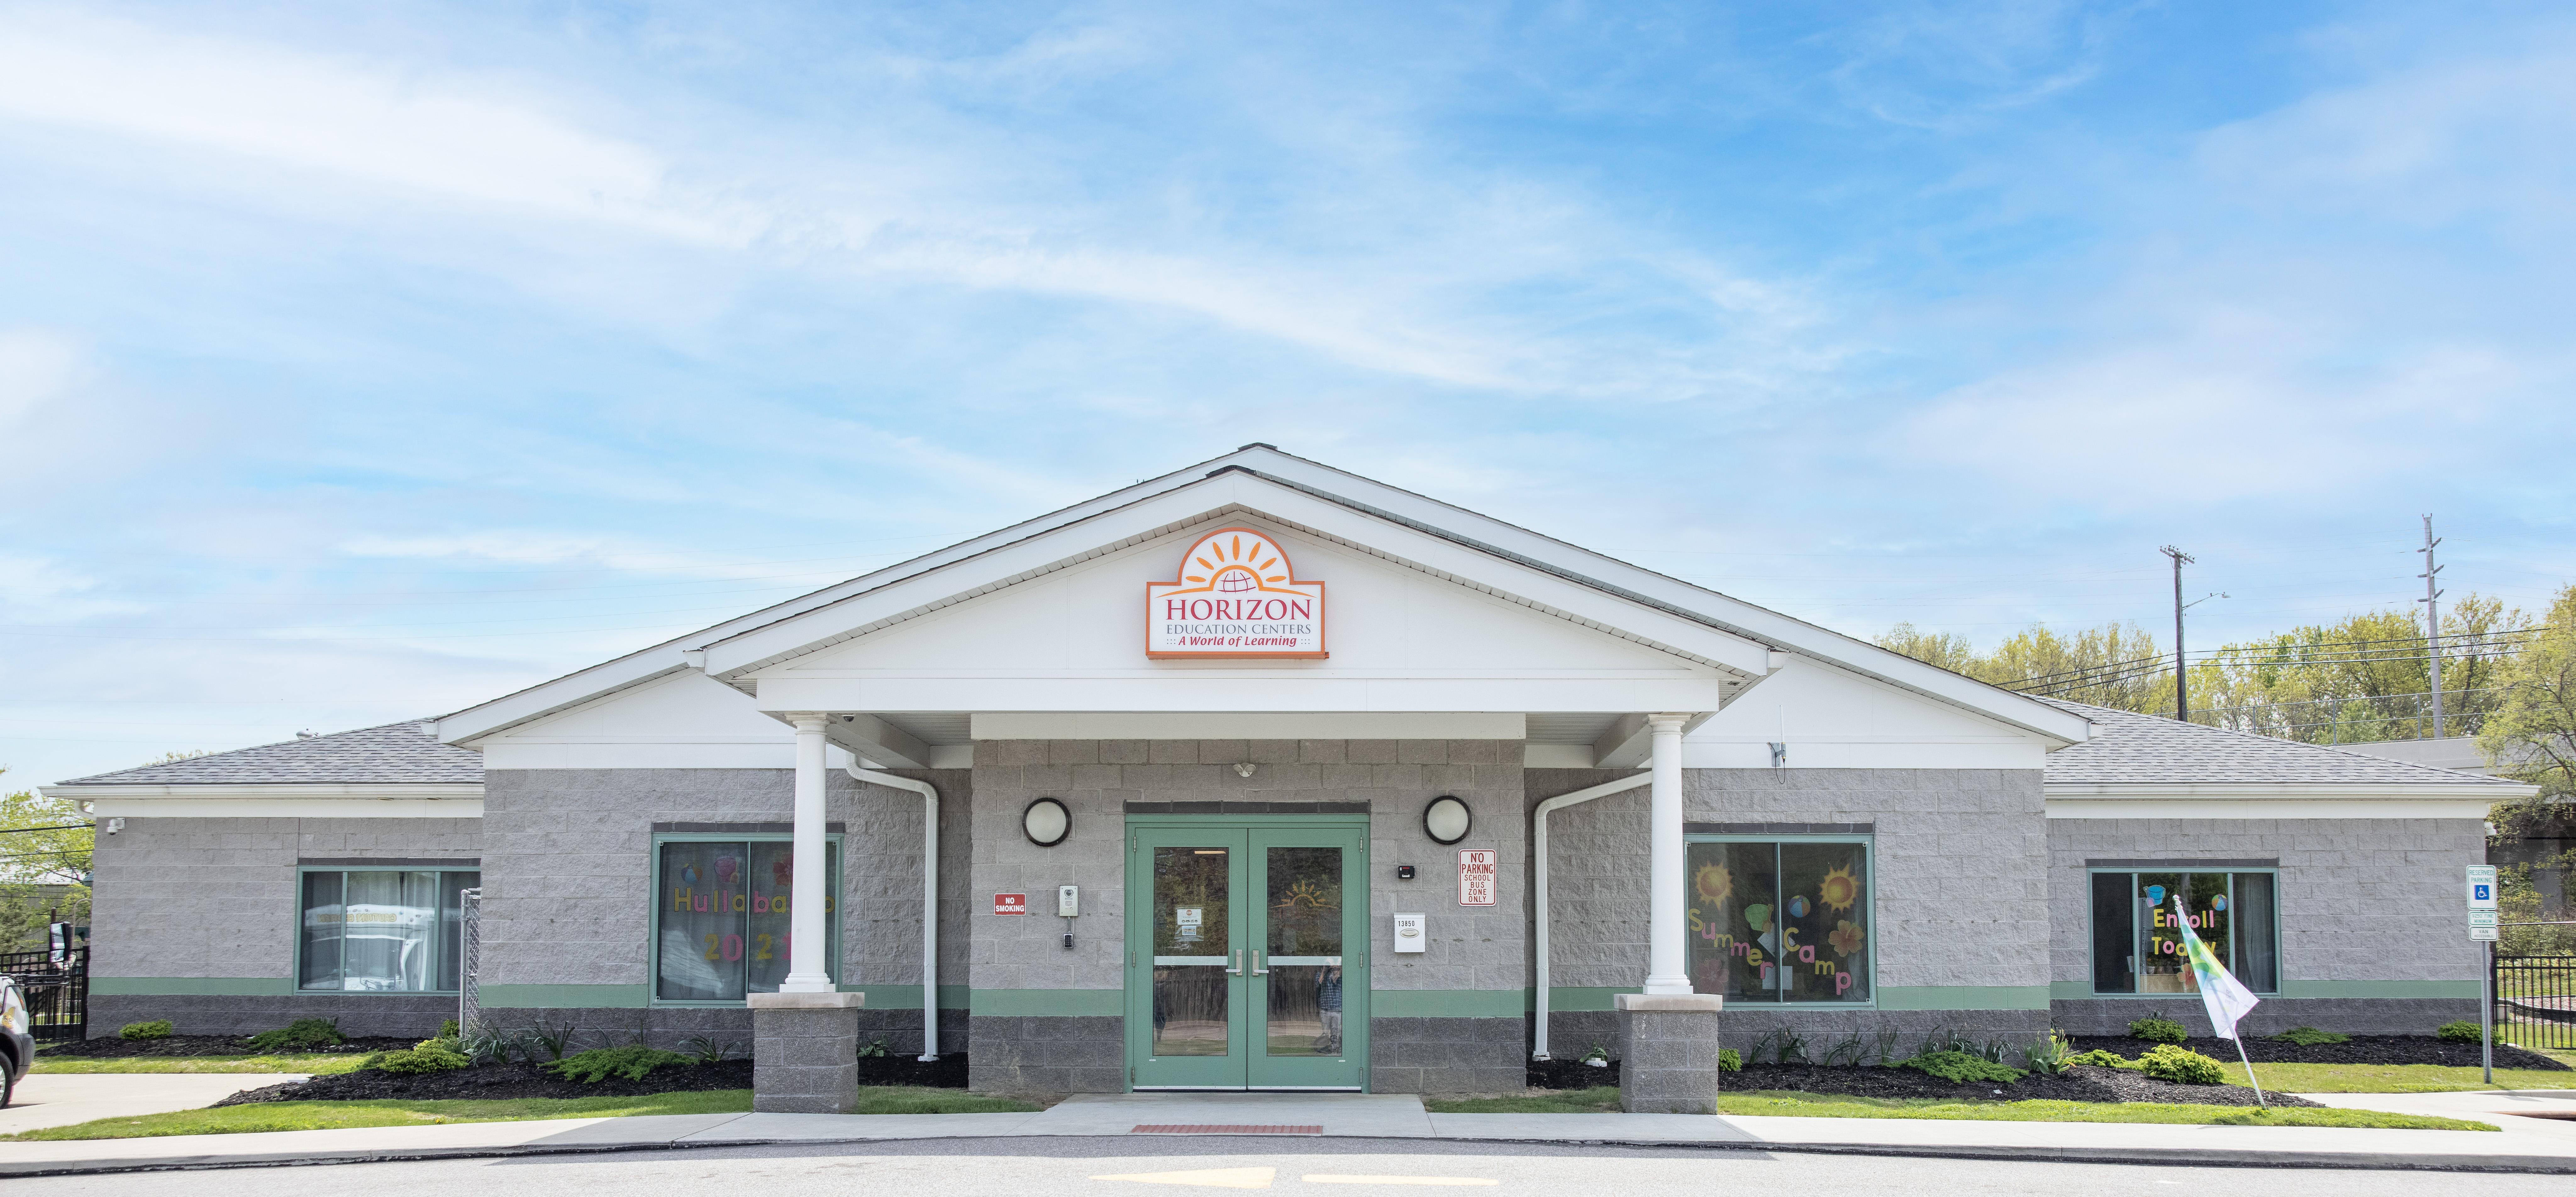 Triskett Station Center Achieves 5-Star Rating